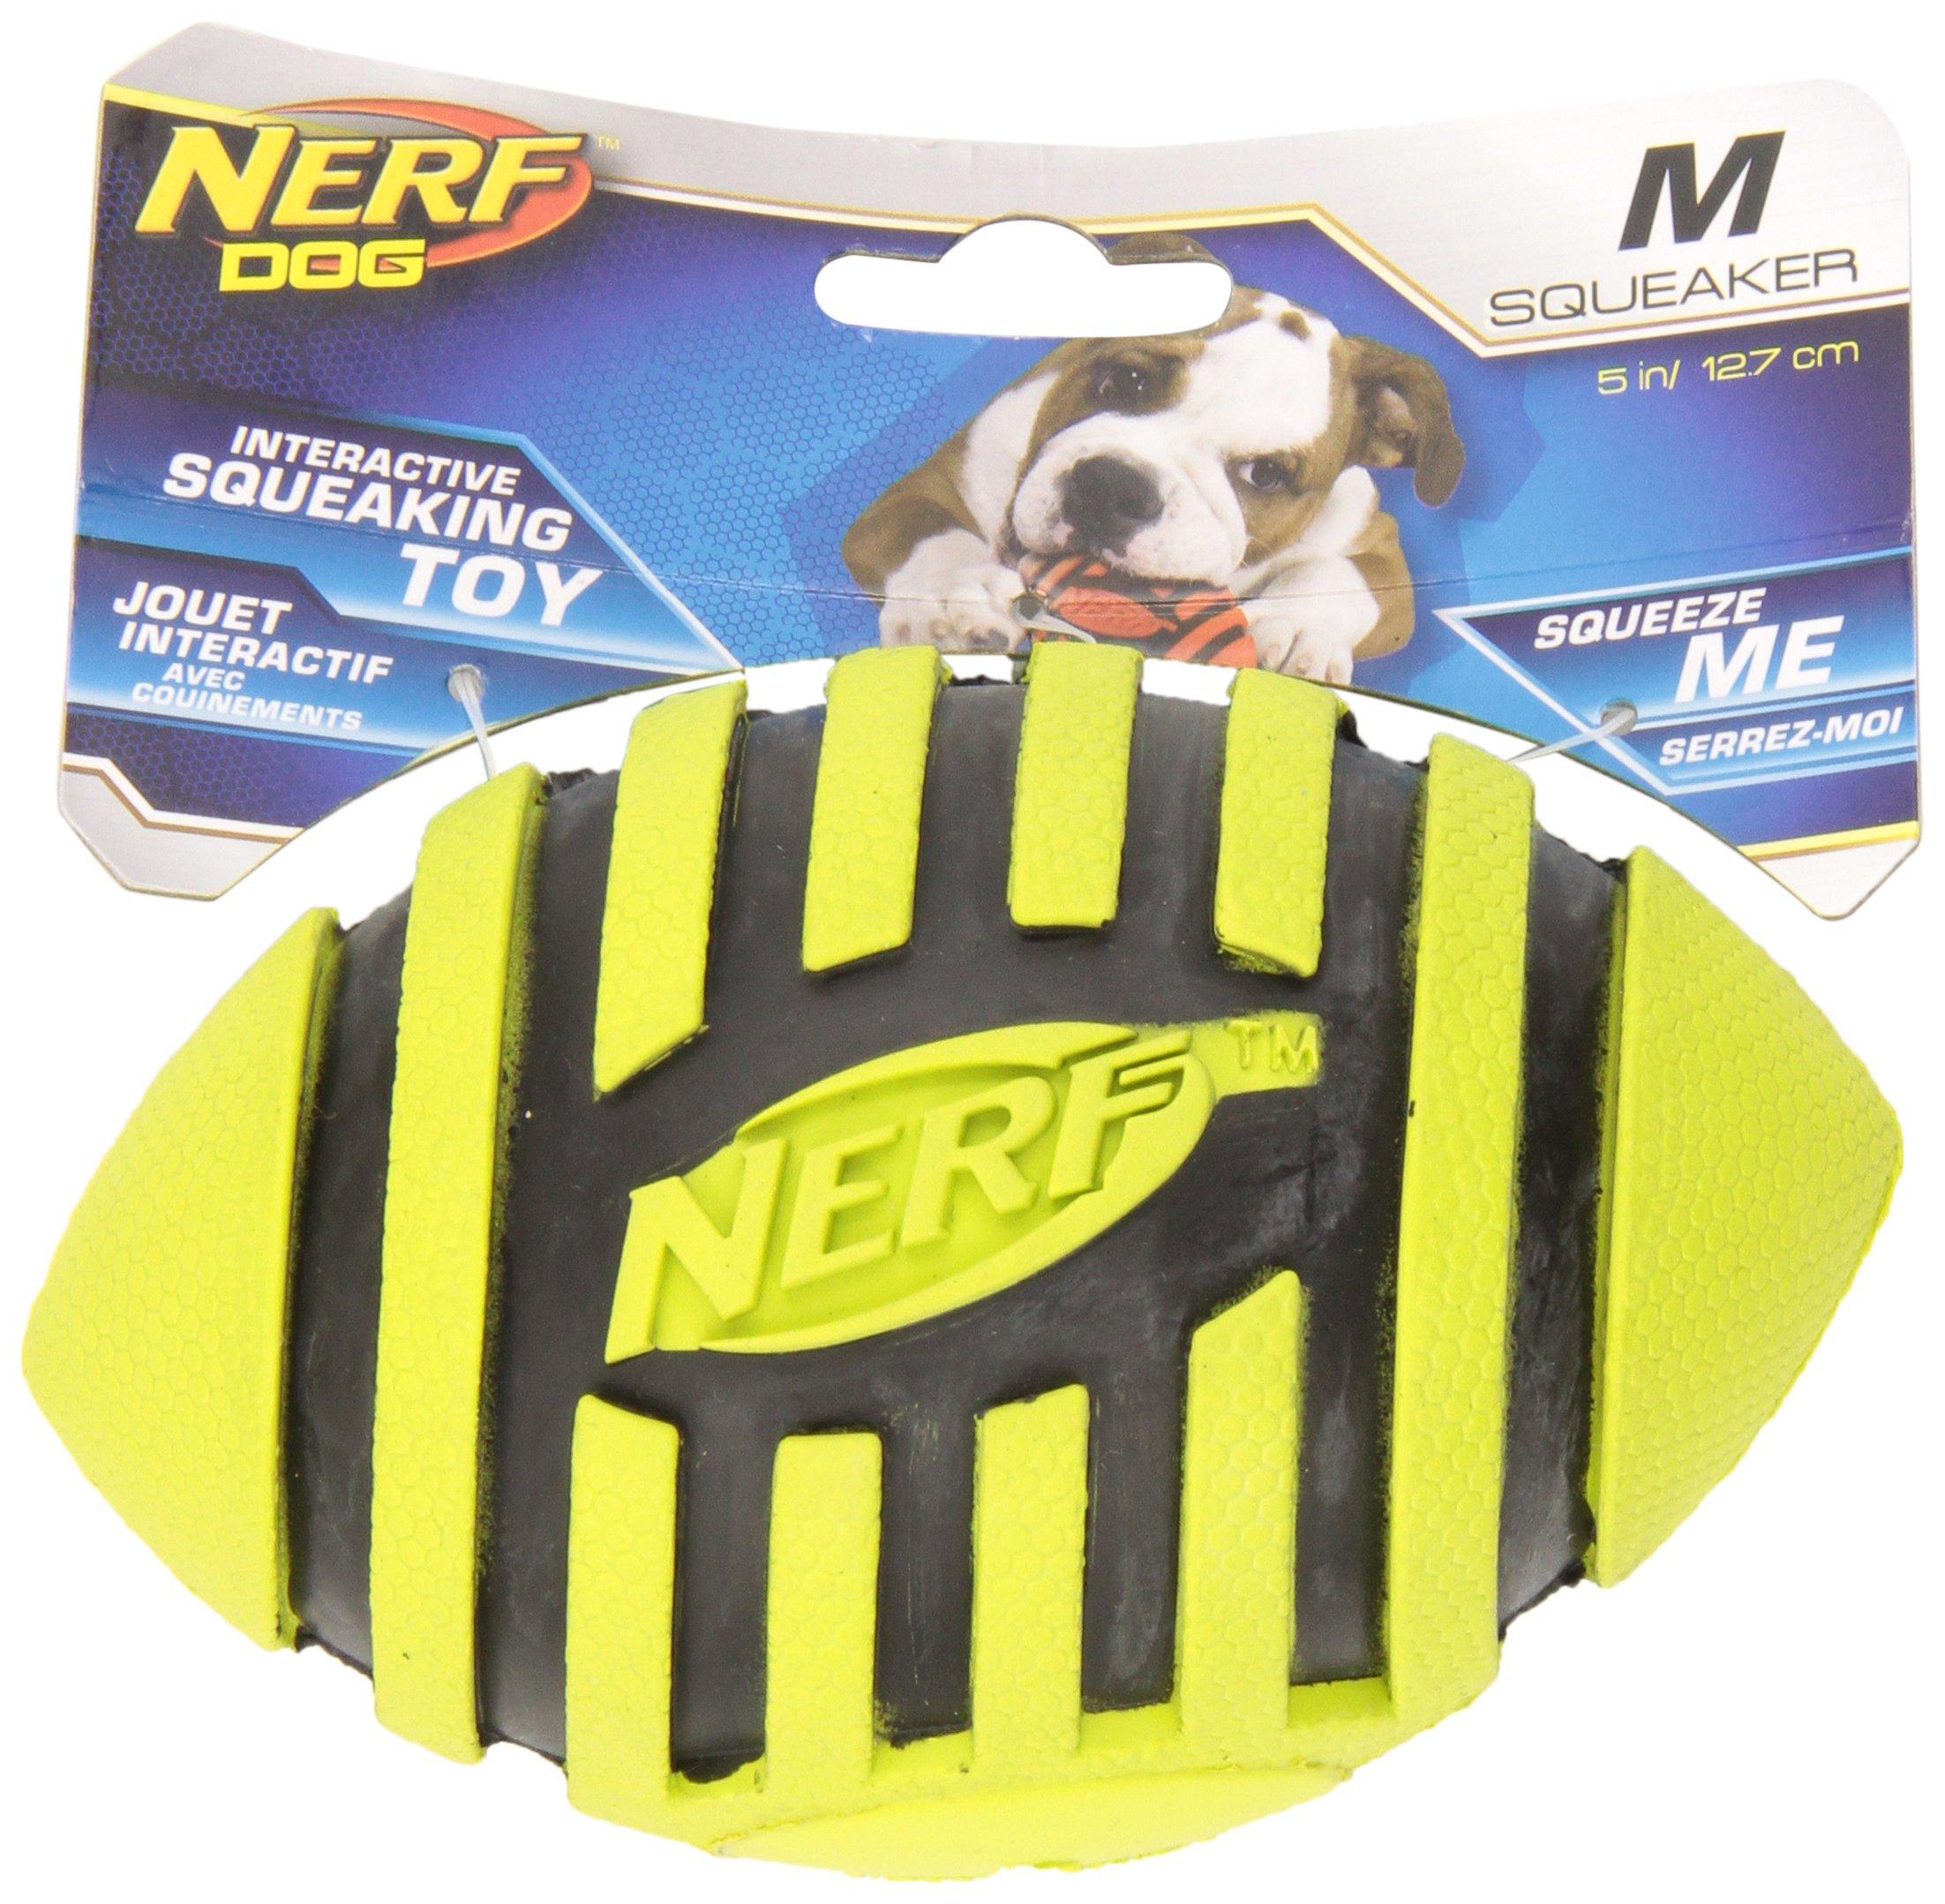 Nerf Dog Toys Spiral Squeak Football, 5'', Orange/Green